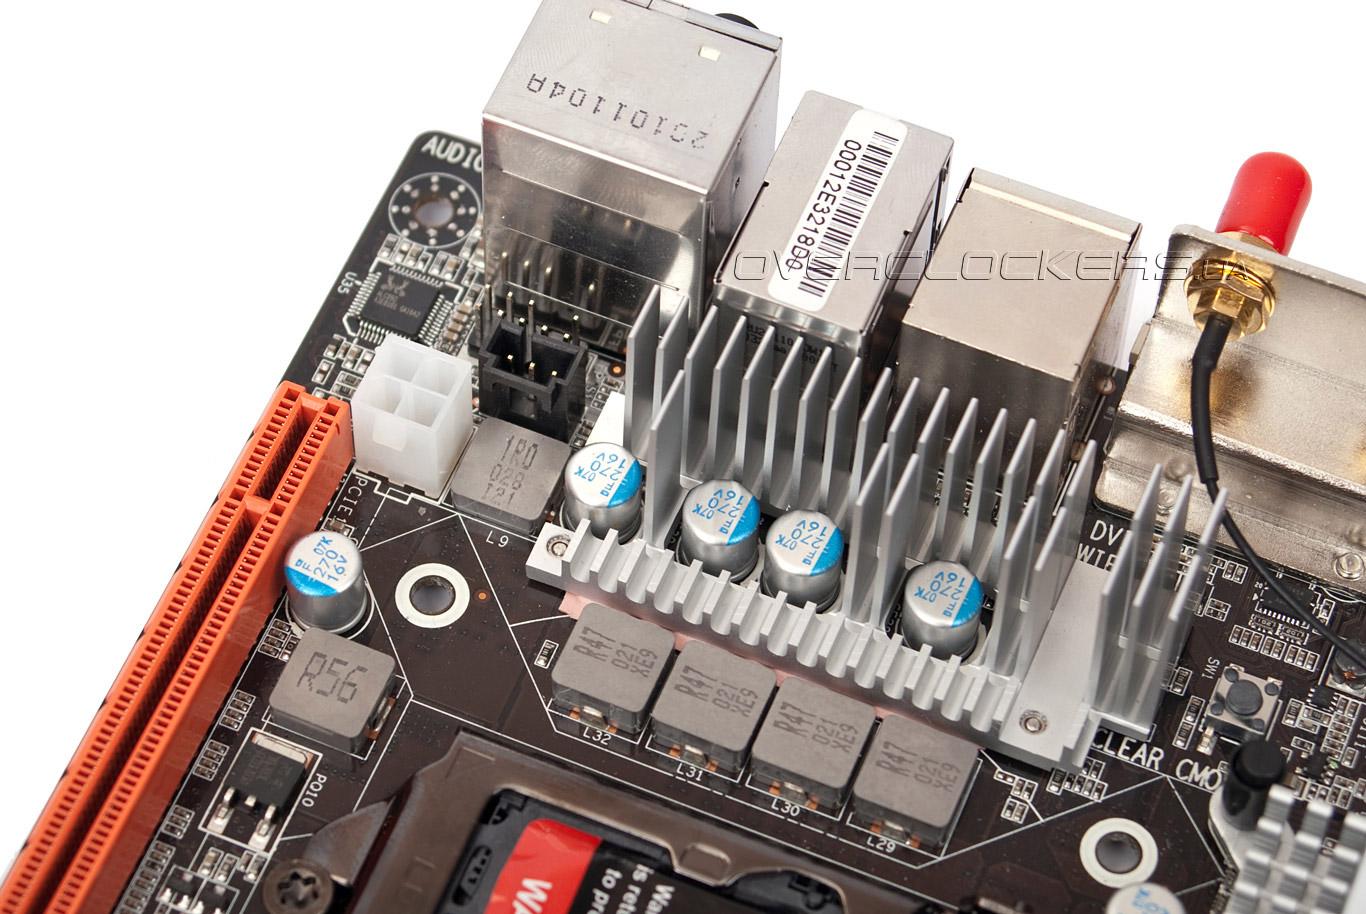 Zotac H67ITX-C-E JMicron SATA Controller Drivers Windows 7